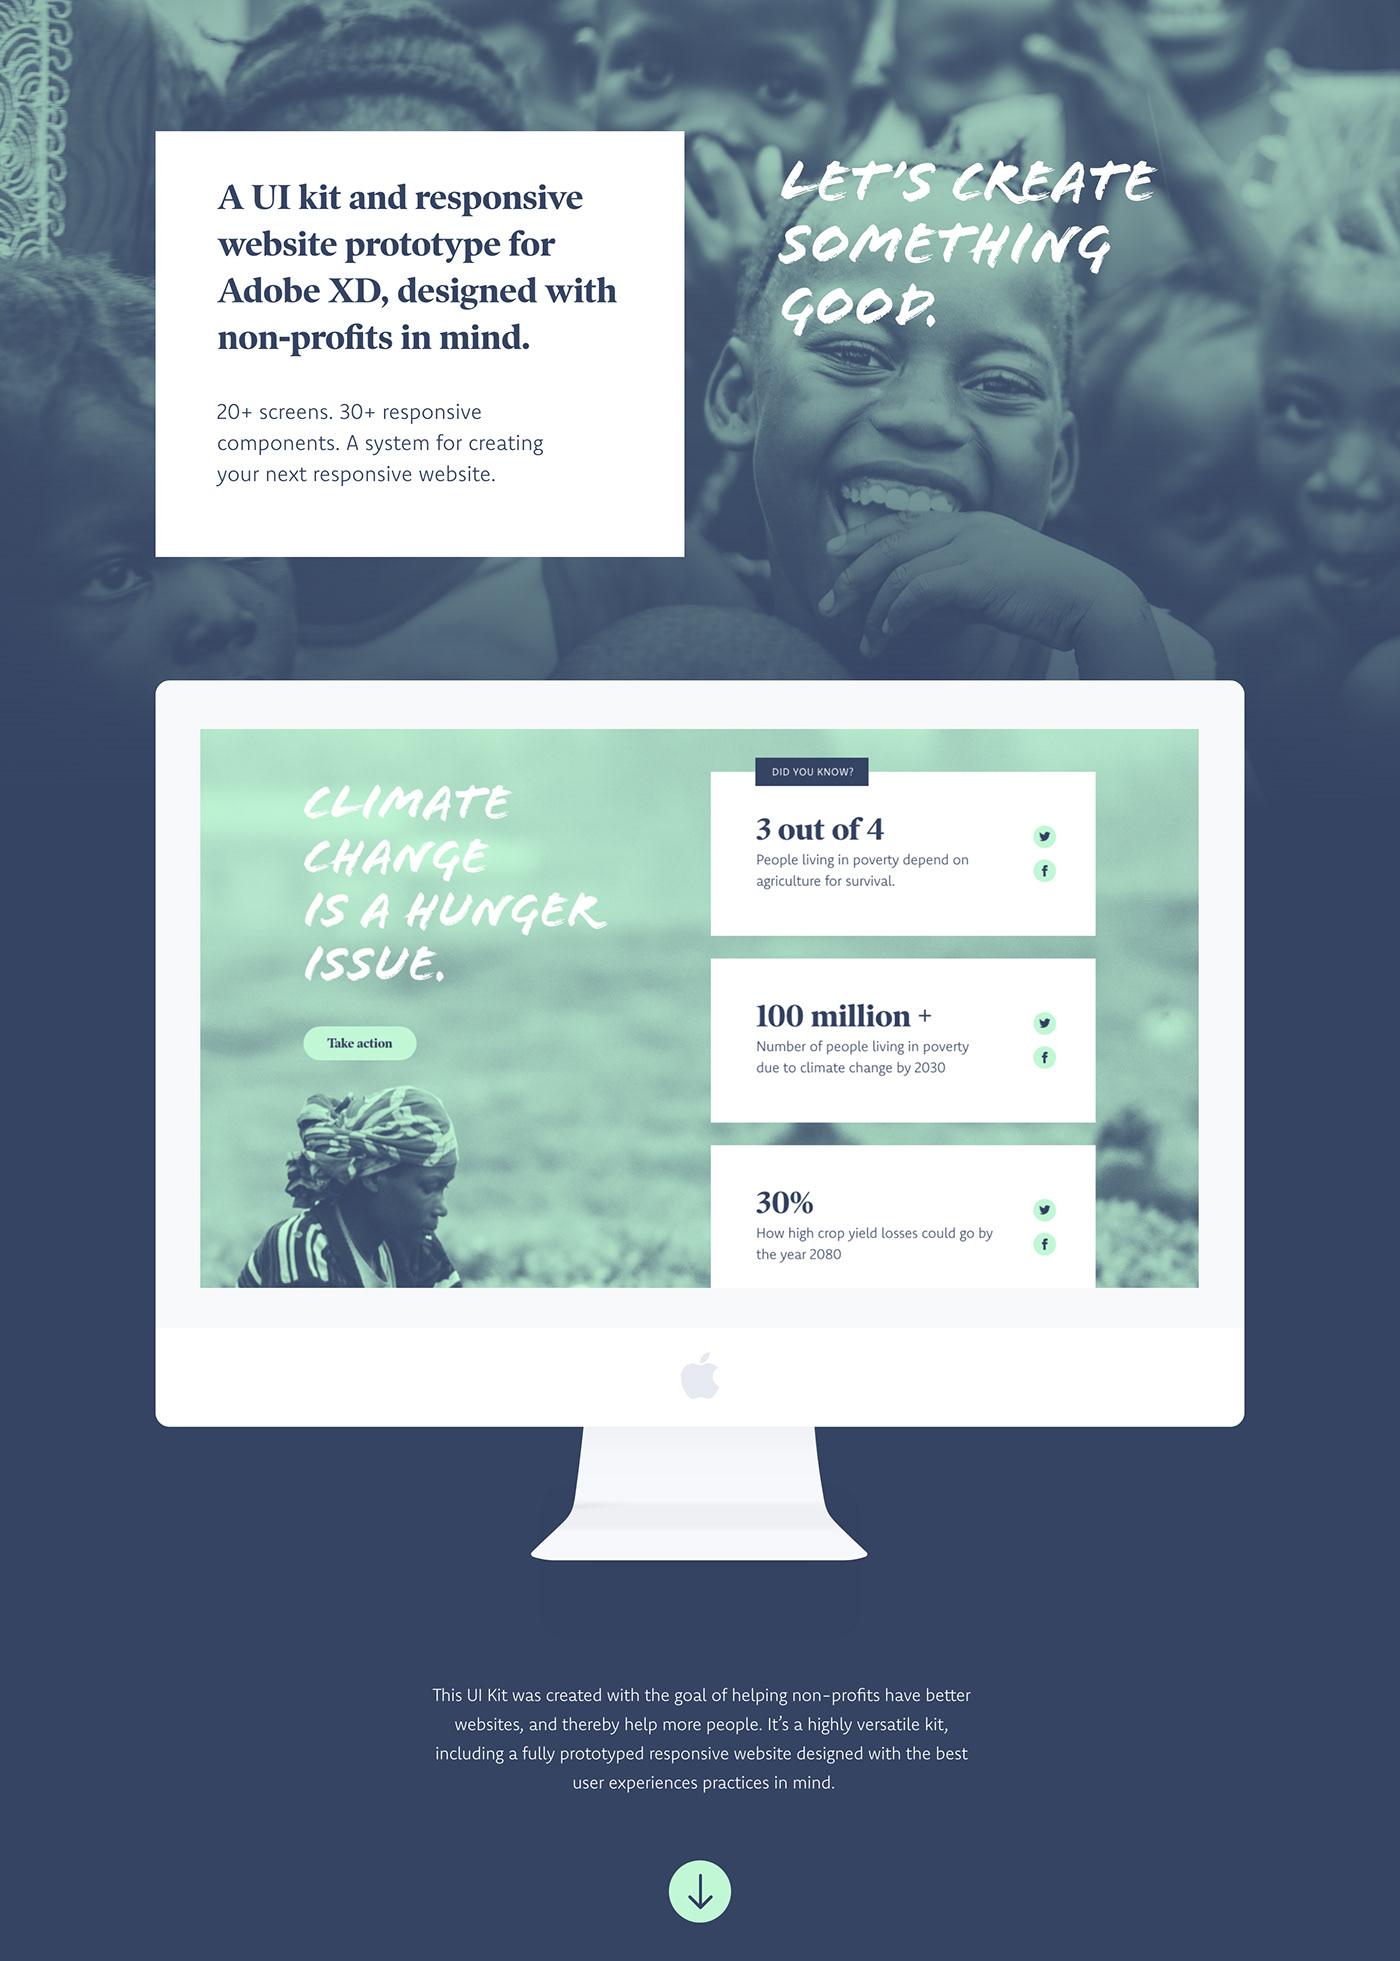 Responsive web design,Responsive,ui design,ui kit,Free Resources,marketing website,mobile design